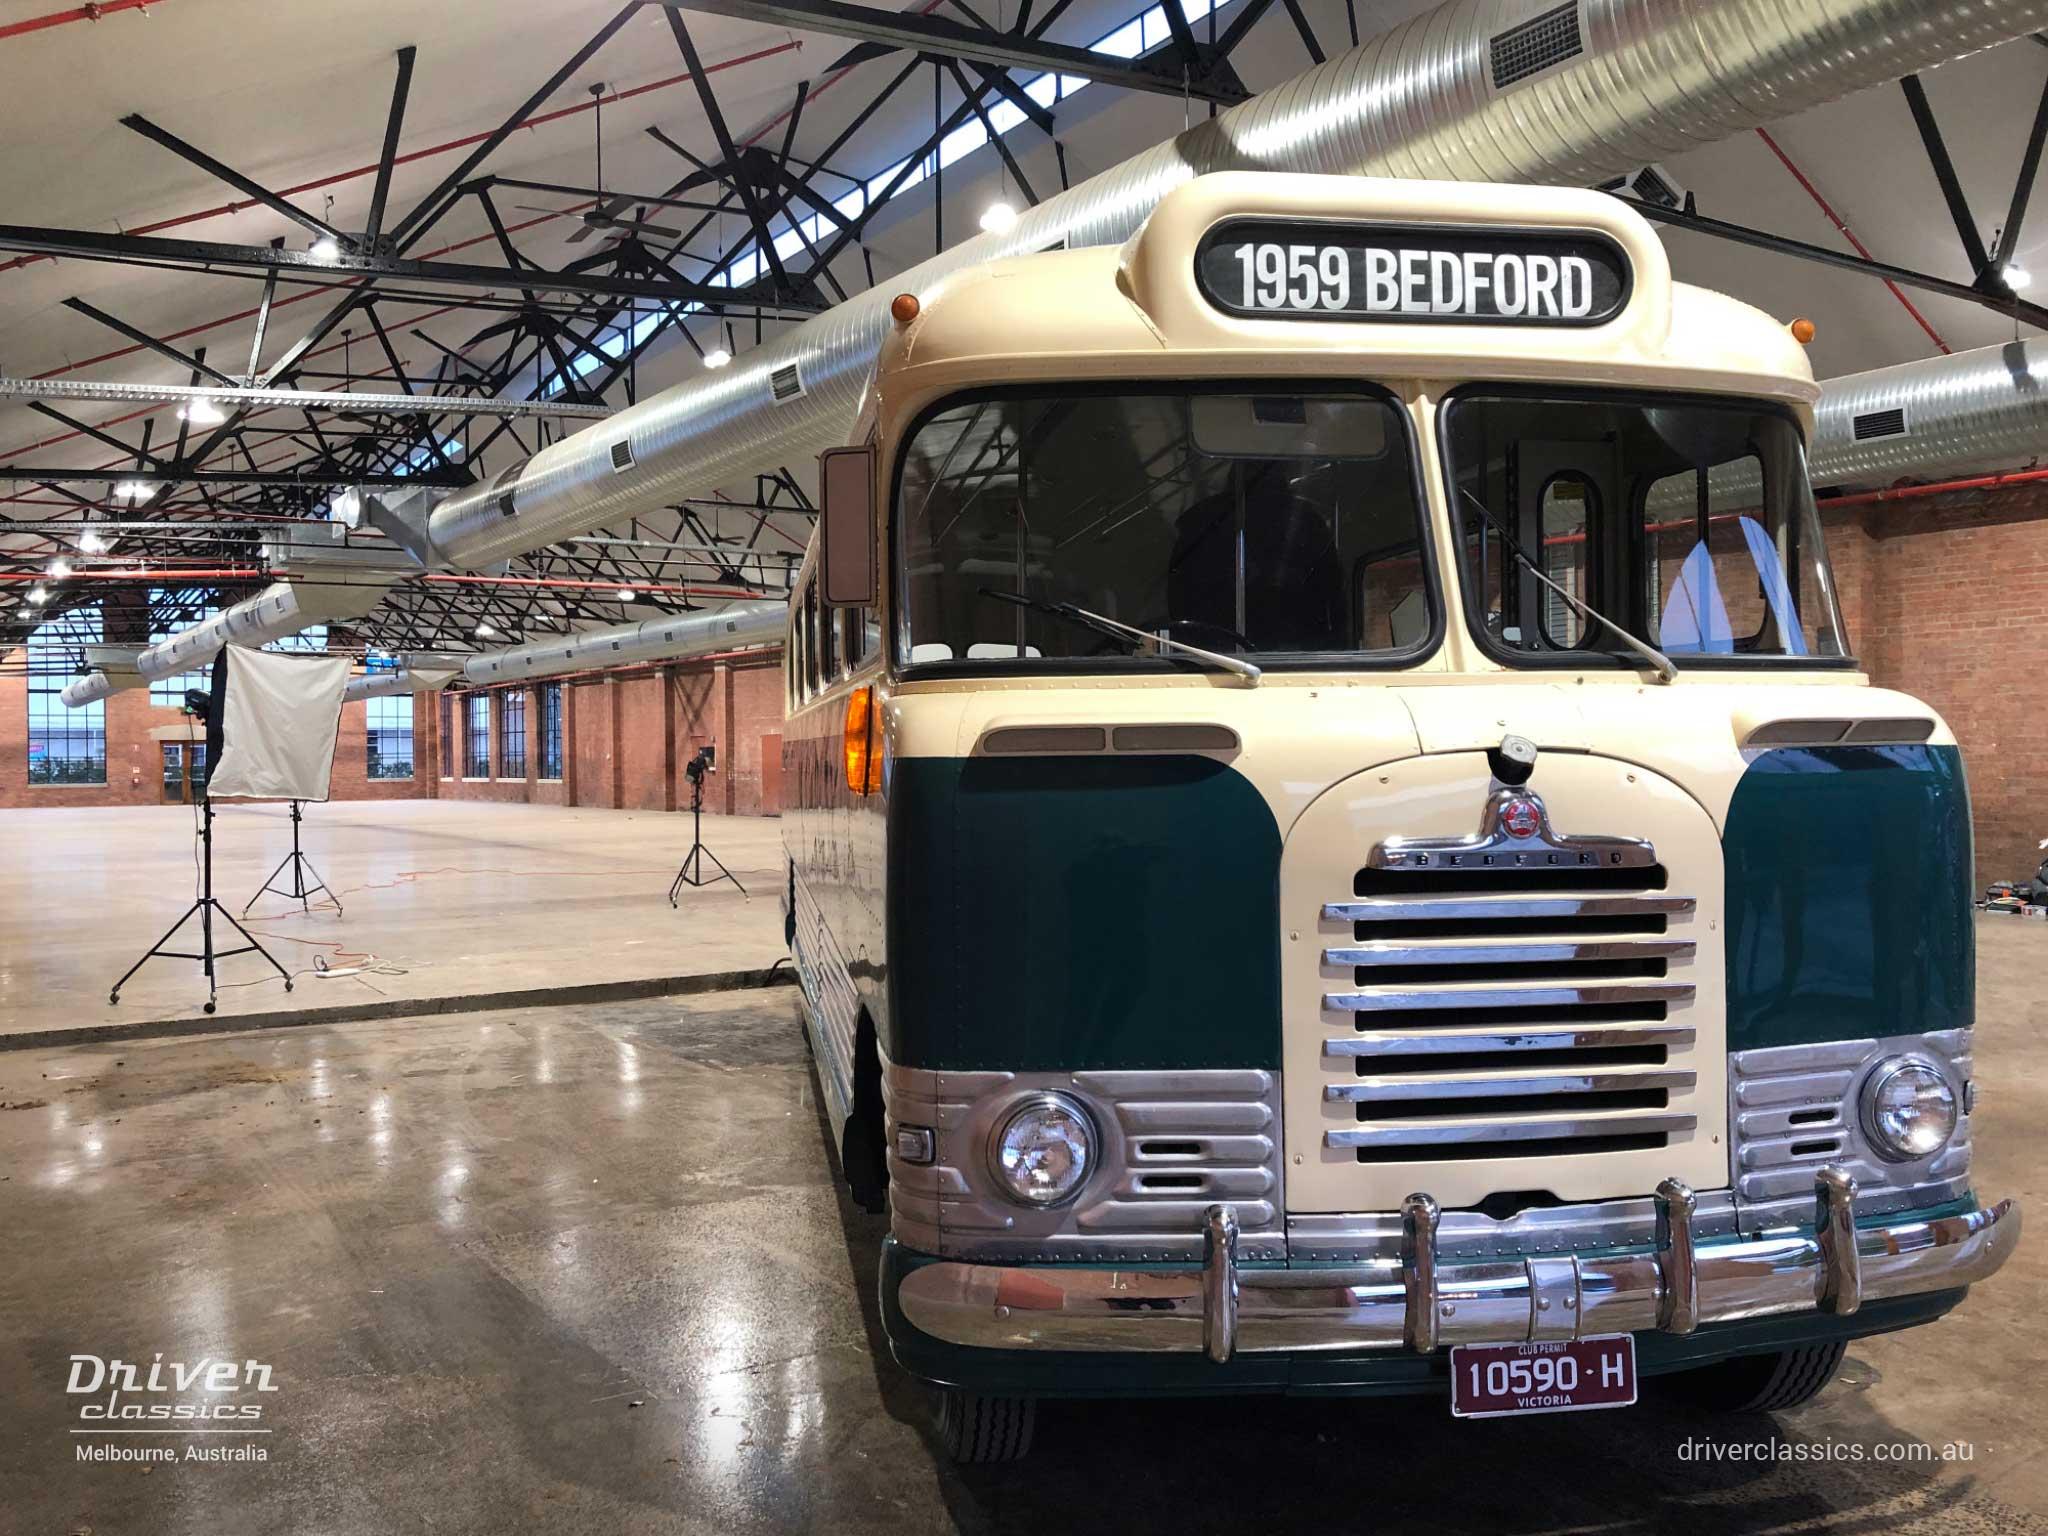 1959 Bedford SB3 bus, on a film set, Geelong VIC, phot taken May 2019